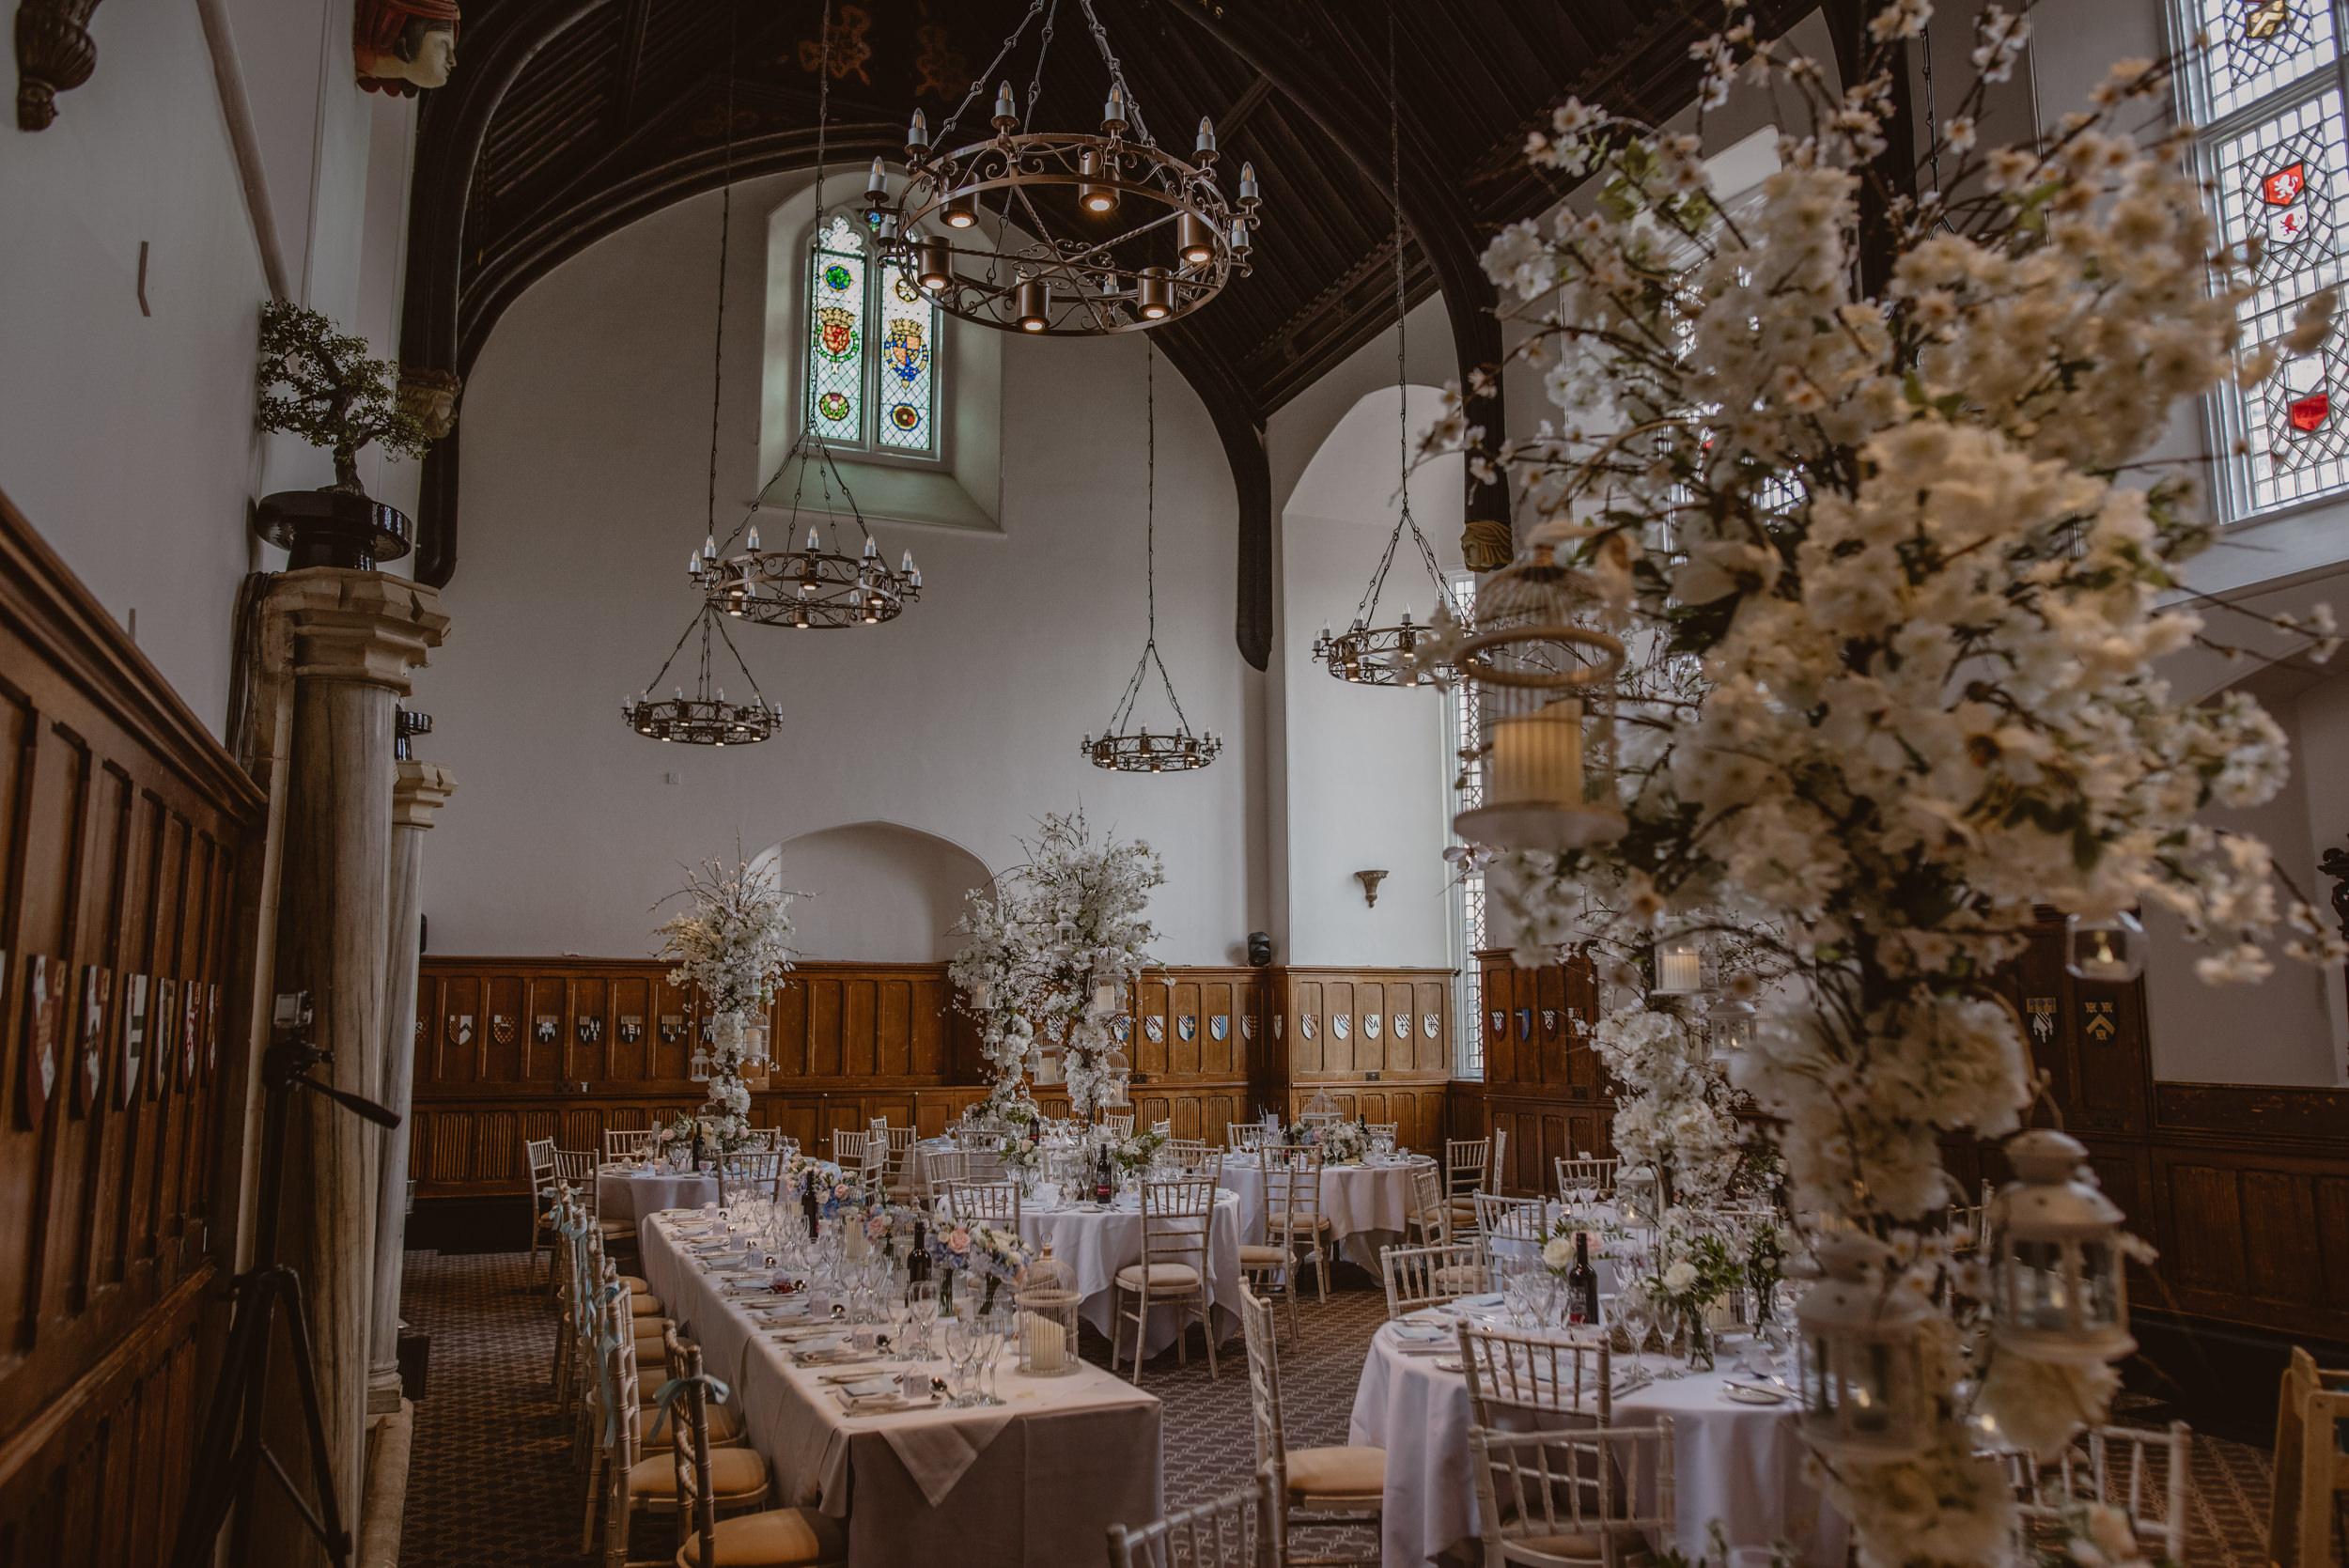 Rachel-and-James-Wedding-Horsley-Towers-State-Manu-Mendoza-Wedding-Photography-359.jpg